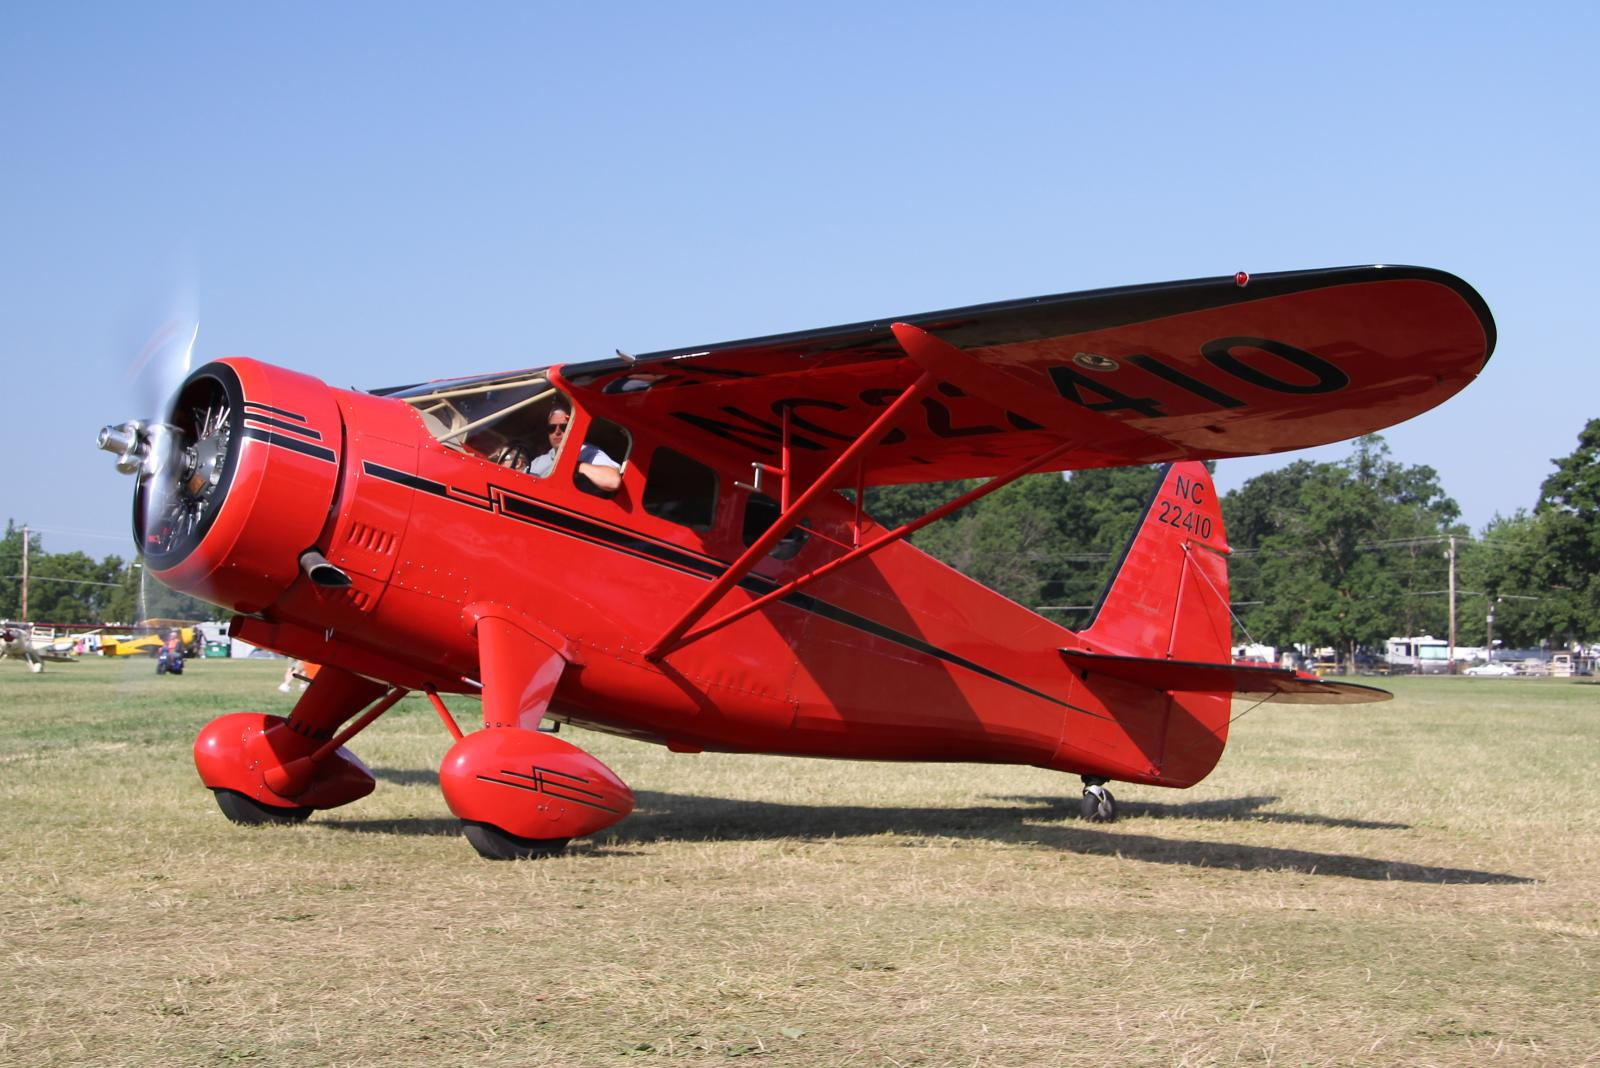 File Howard Aircraft Dga 15p N22410 Jpg